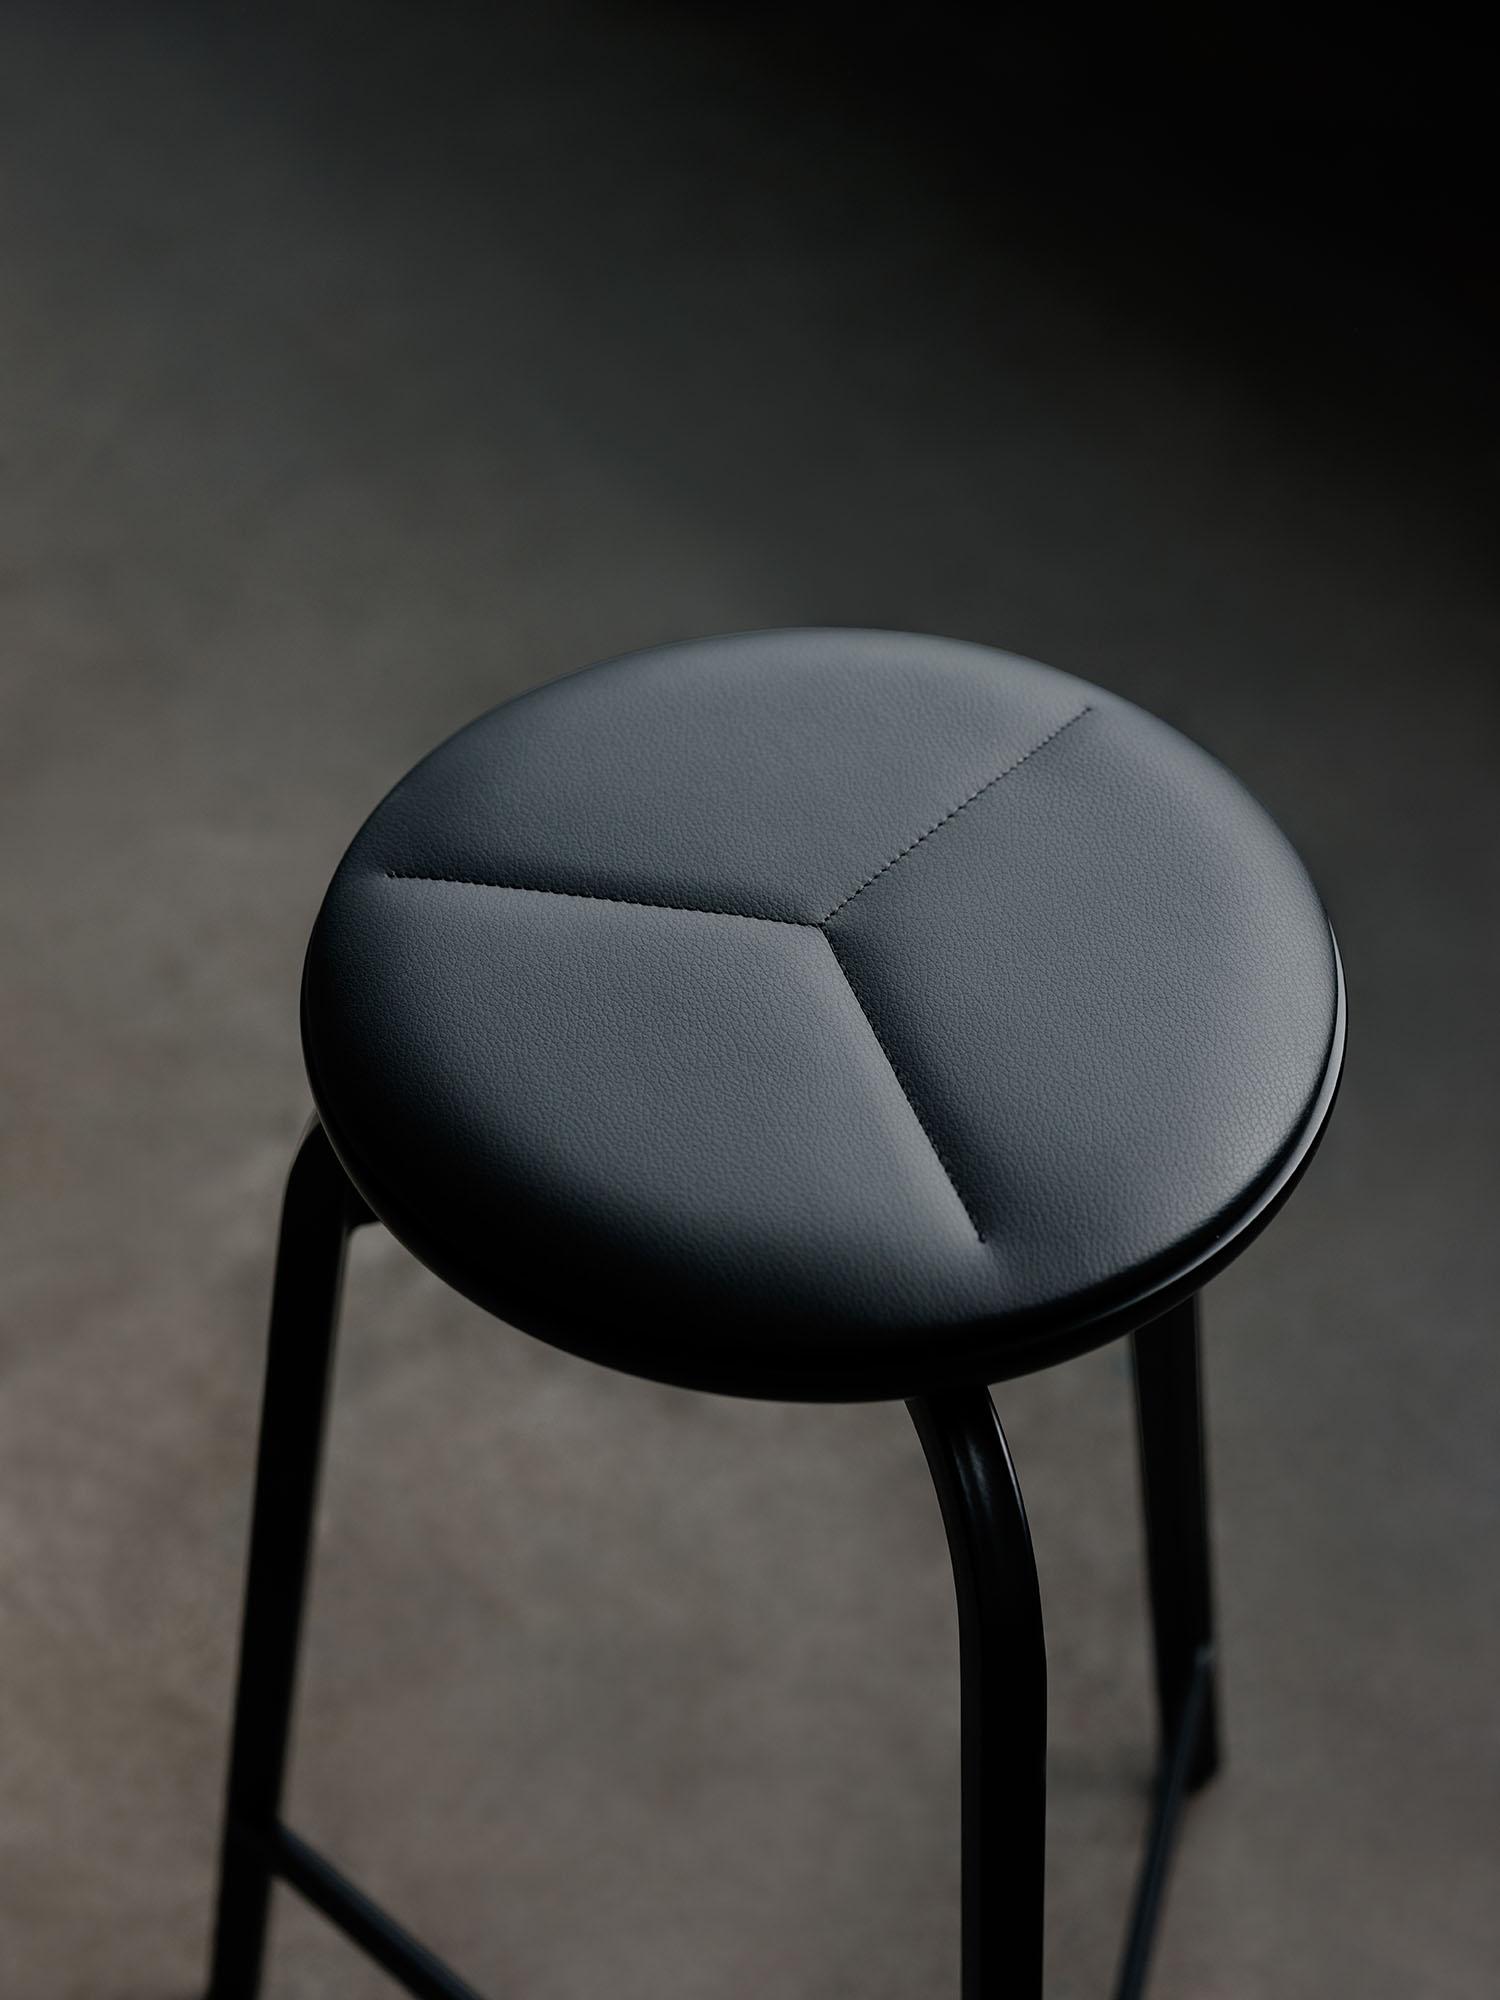 Treble_bar_stool_black_leather-seat_closeup_Northern_Photo_Einar_Aslaksen_Low-res